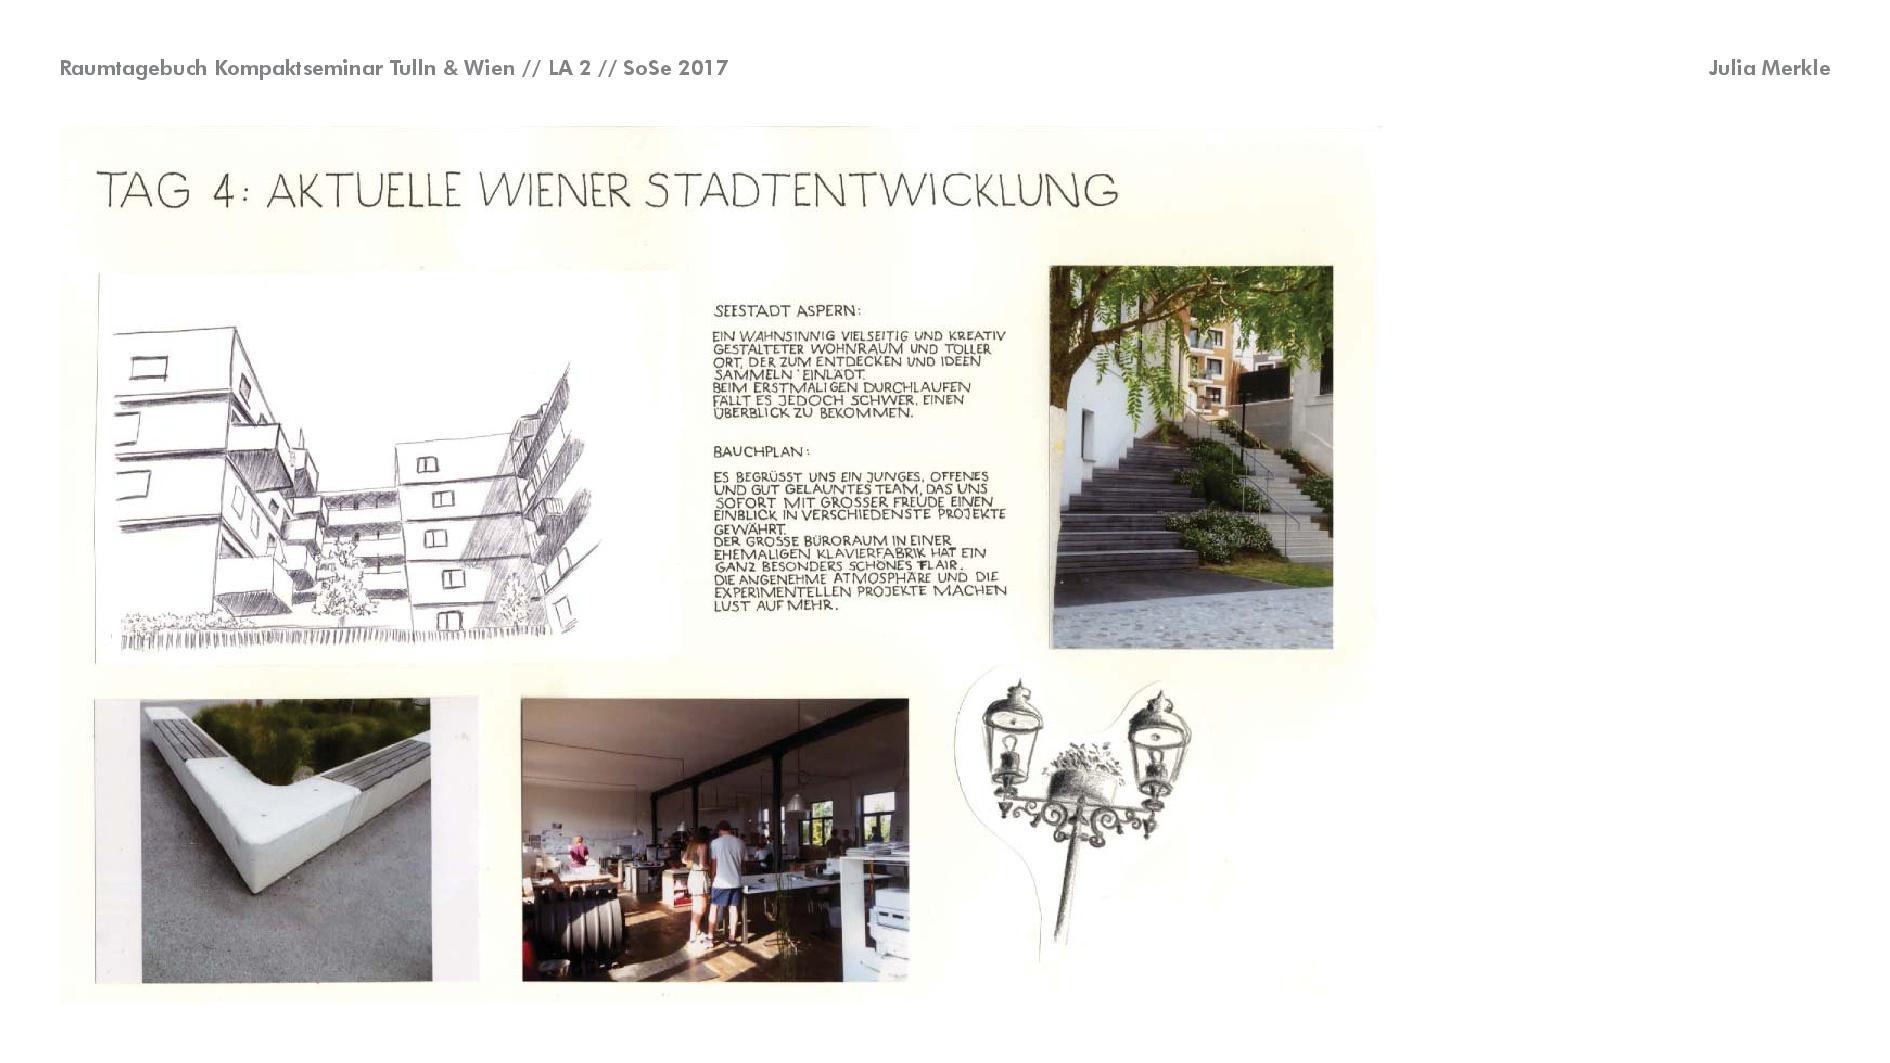 NEU Screen Raumtagebuch Tulln Wien SoSe 17 025